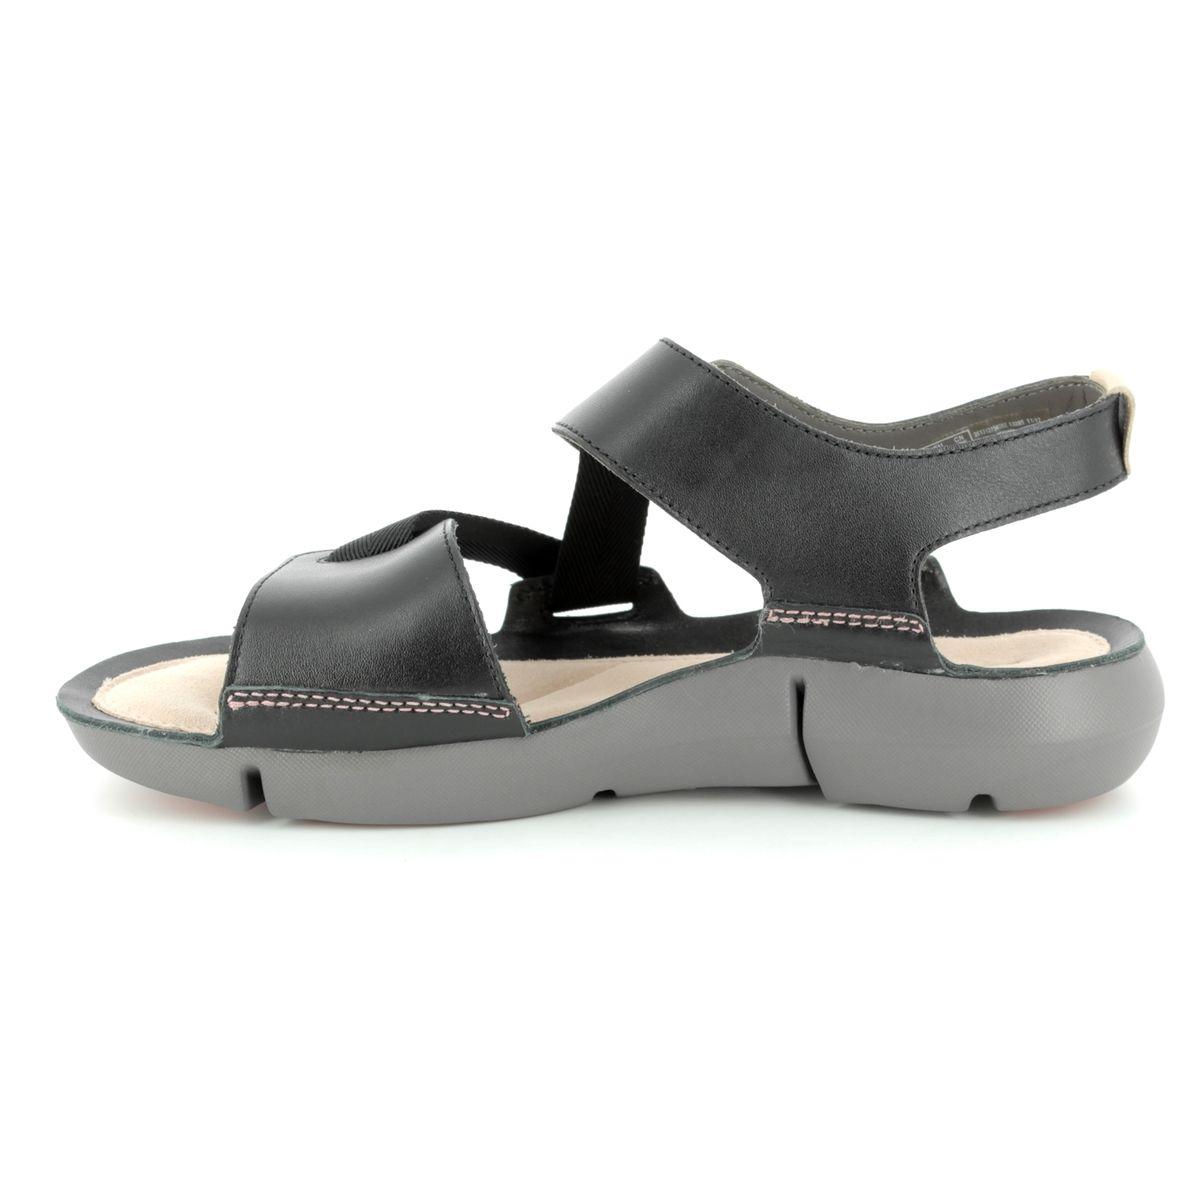 10436892a27581 Clarks Sandals - Black - 3127 34D TRI CLOVER